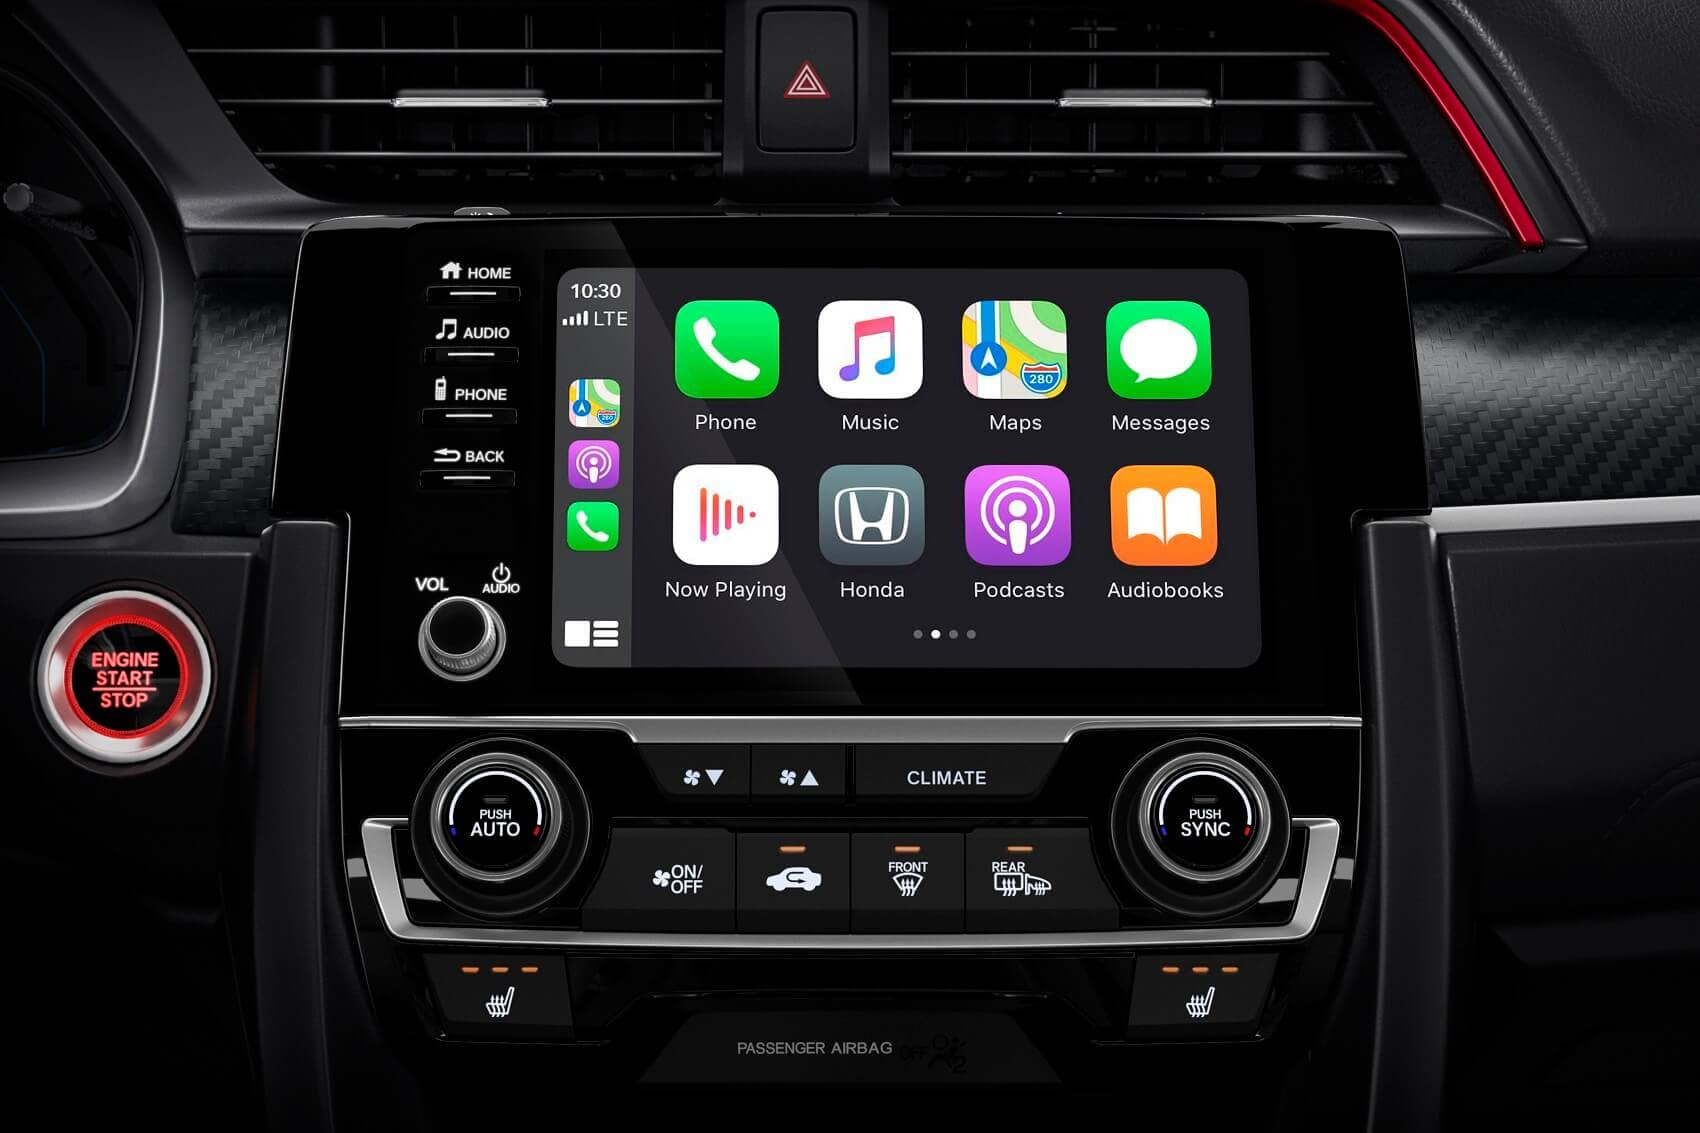 Honda Civic Interior with Apple CarPlay® Technology